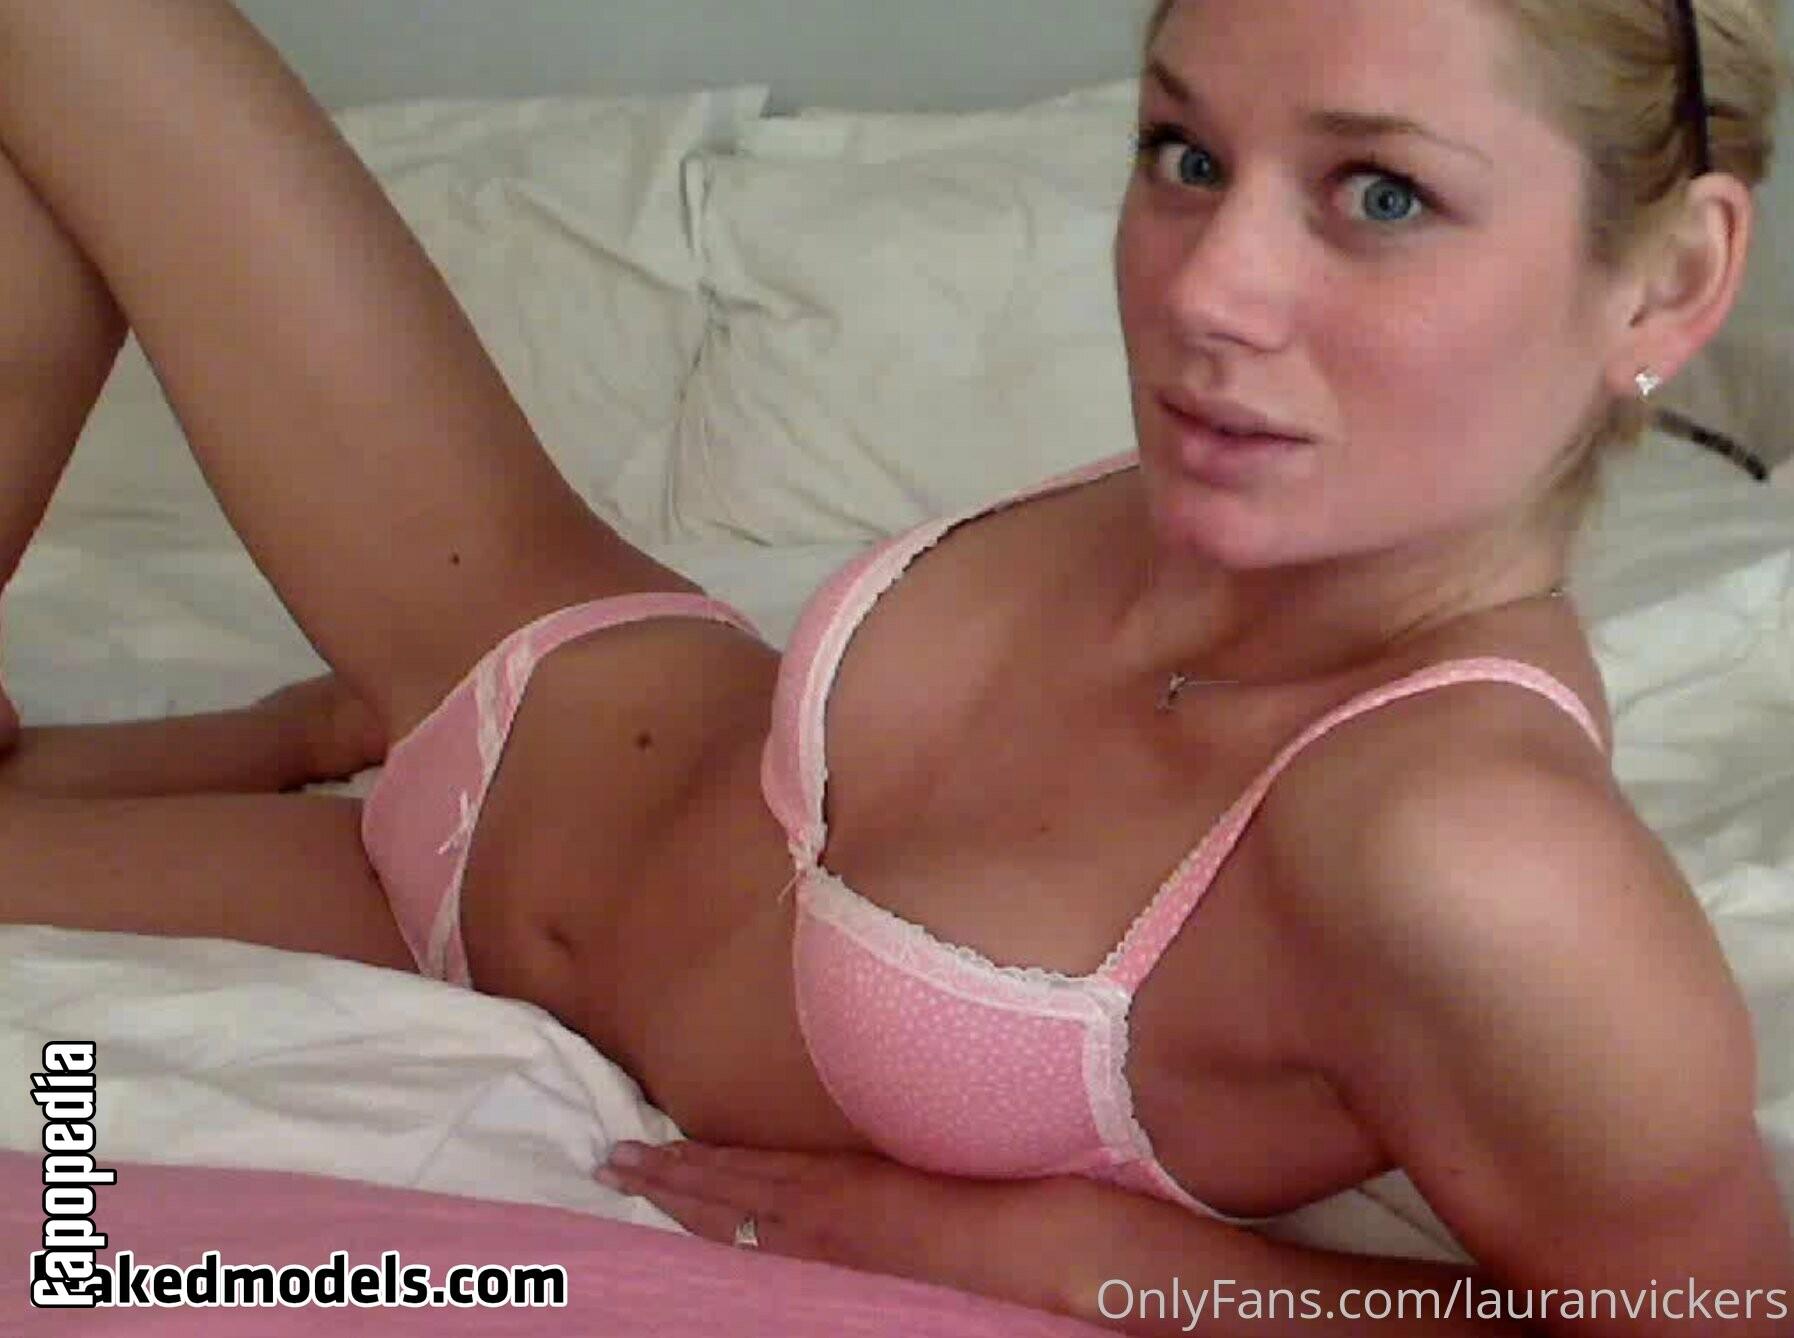 Lauranvickers Nude OnlyFans Leaks